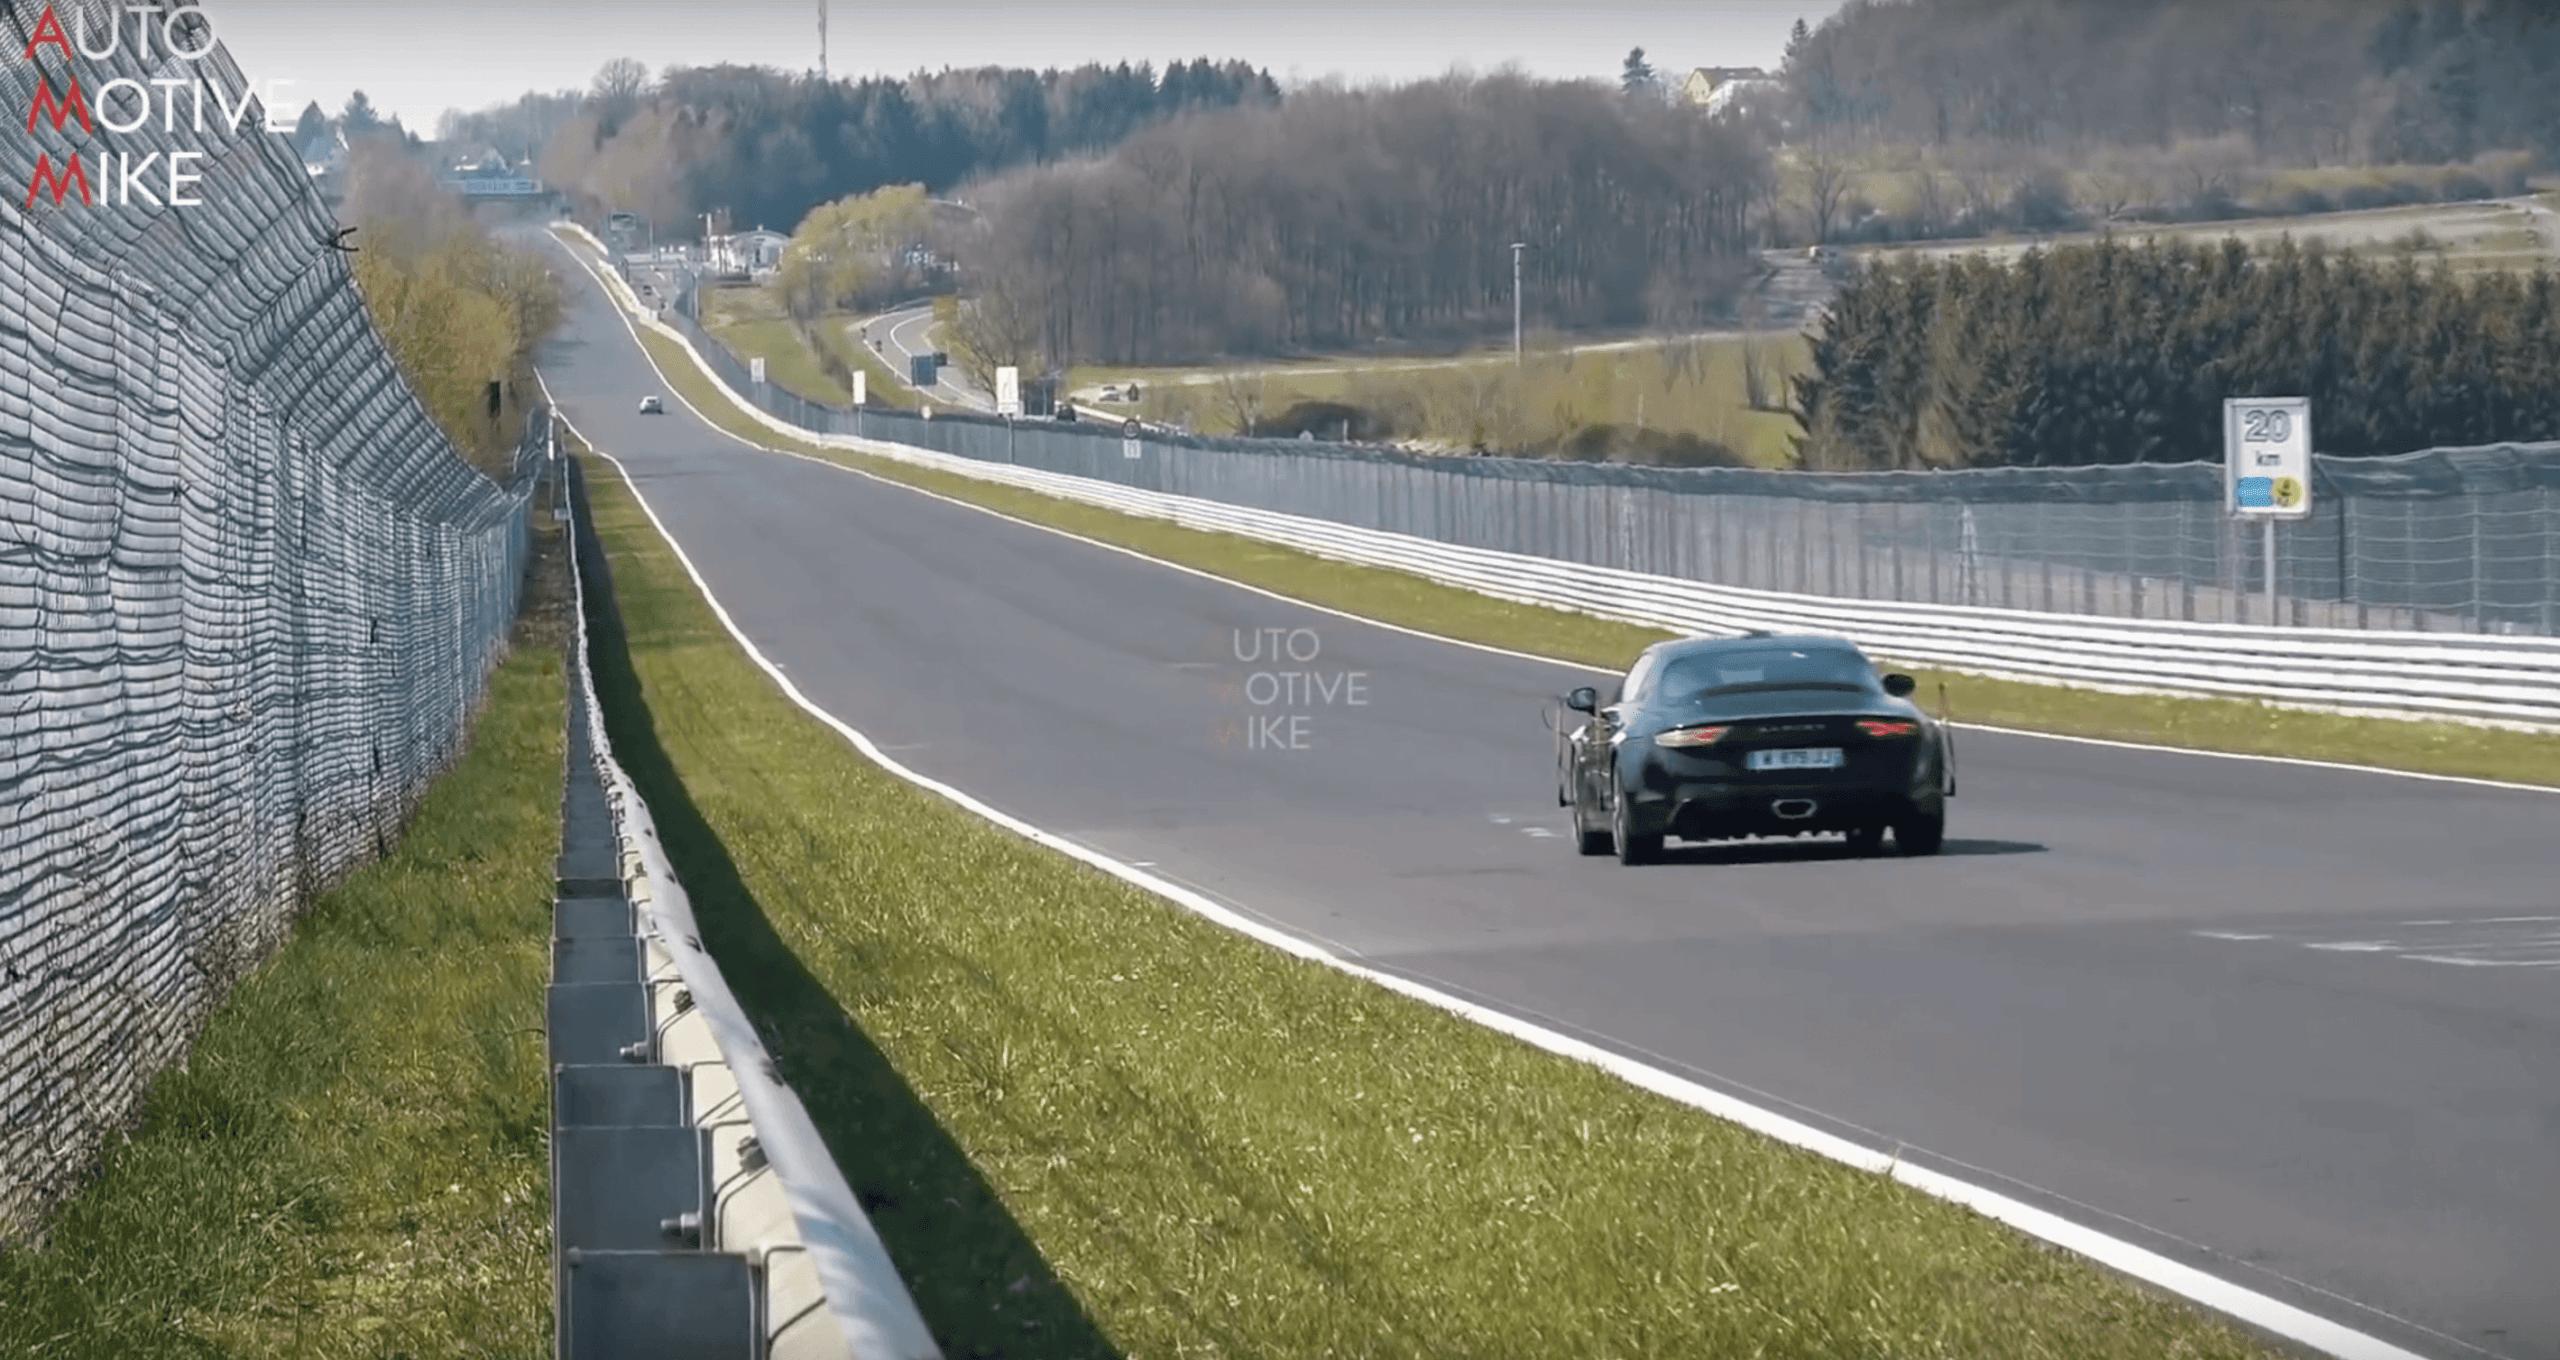 Alpine A110 S AS110 Planet Nurburgring 8 scaled | L'Alpine AS110 / A110 S en balade au Nürburgring ?